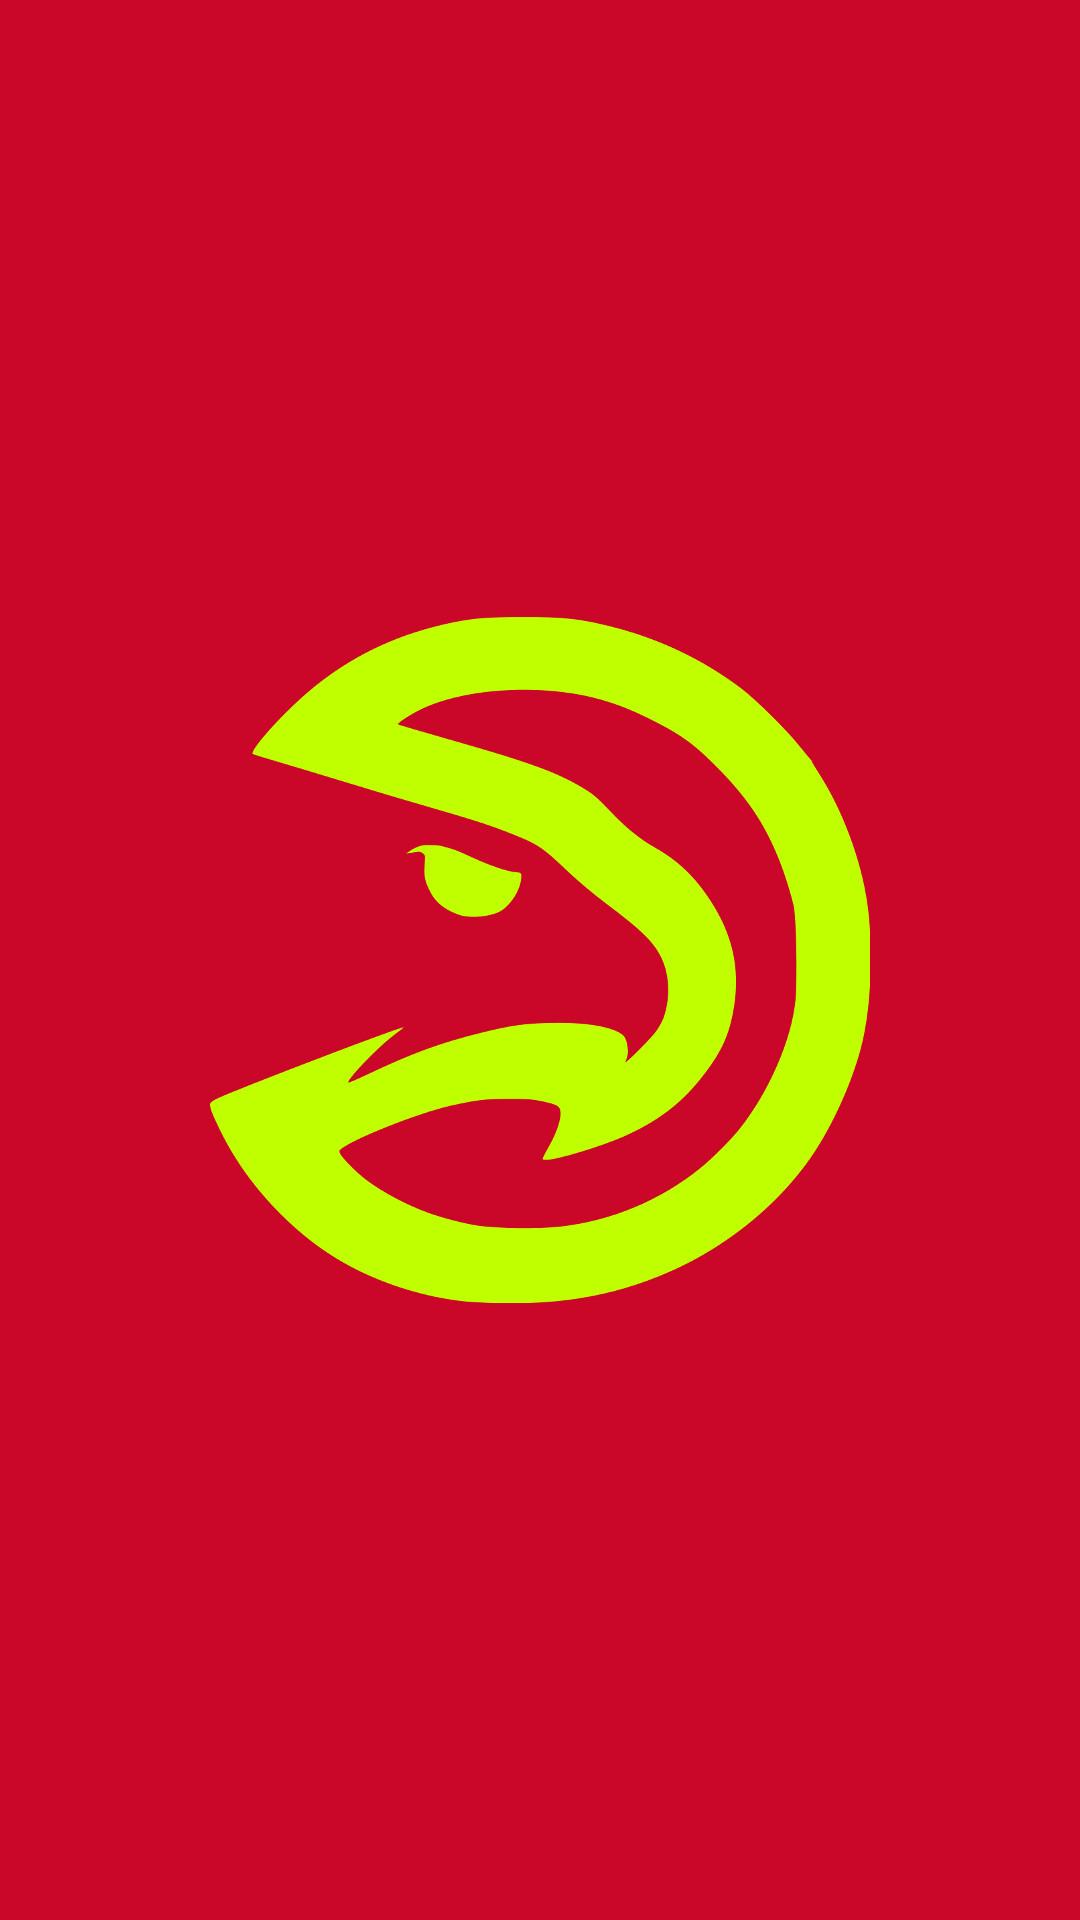 Golden State Warriors Wallpaper Hd Atlanta Hawks Wallpapers 183 ①